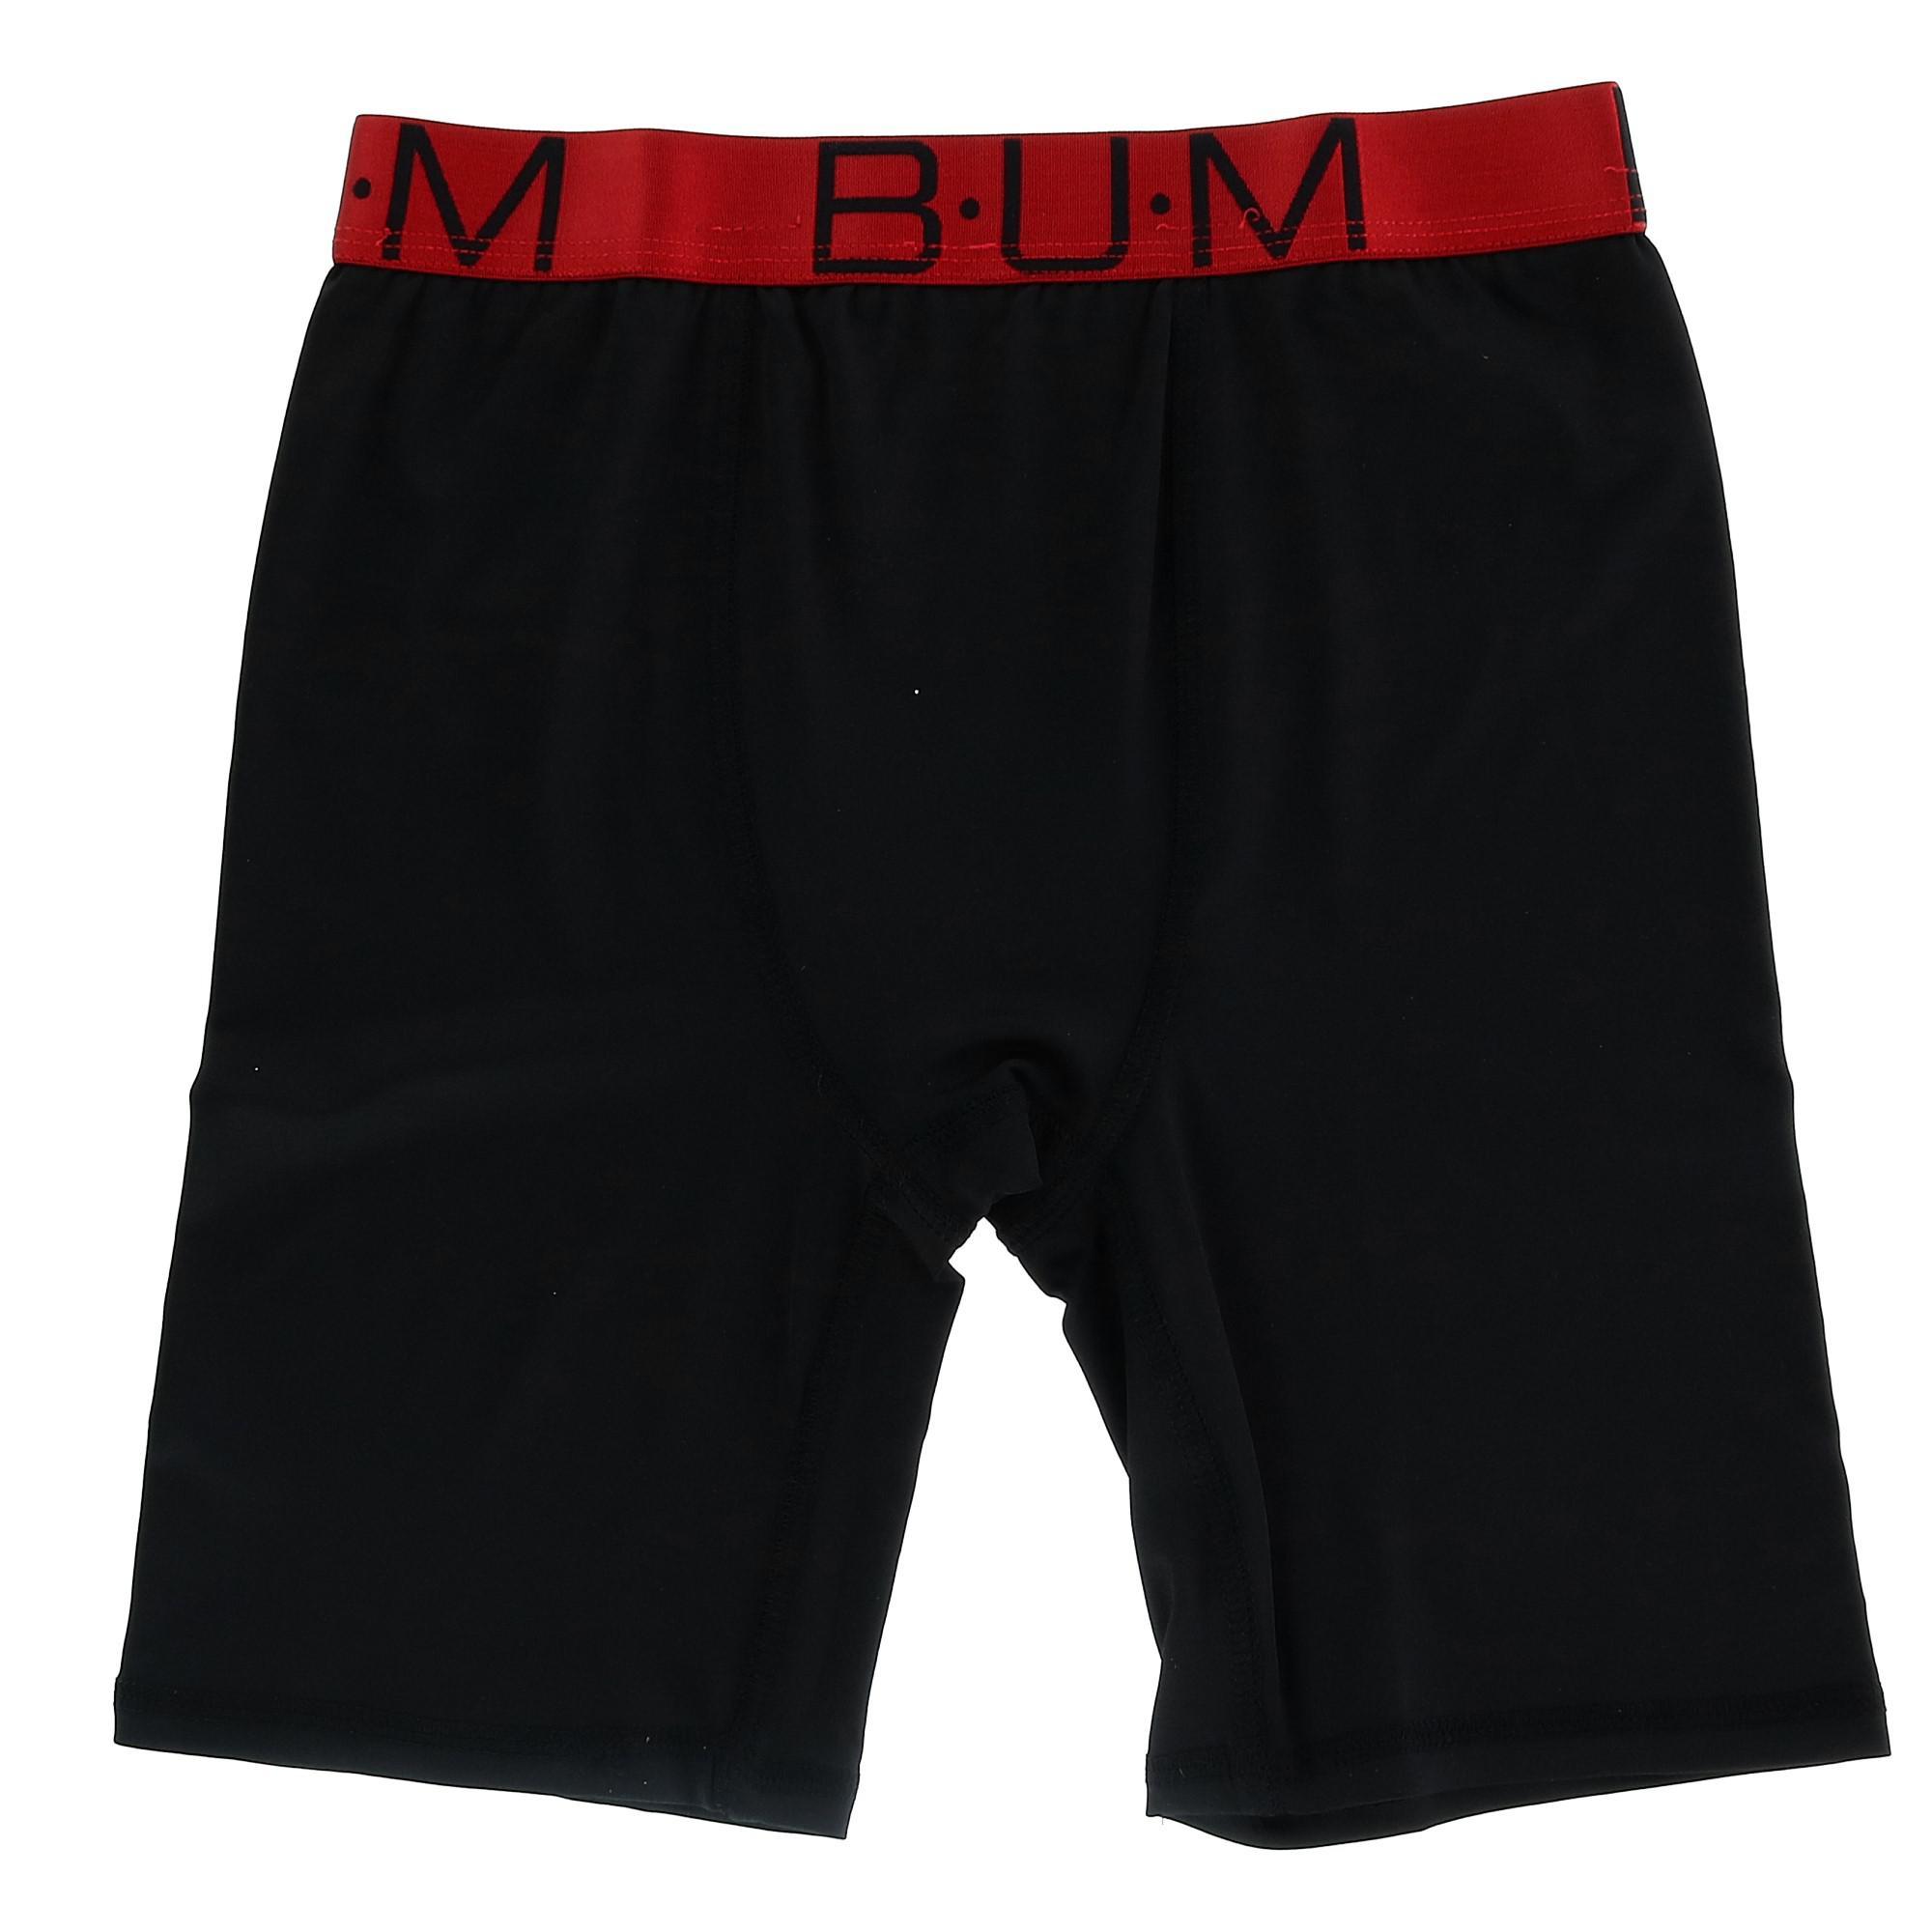 Boy/'s Knit Boxer Short Underwear 2 Pair Pack New B.U.M